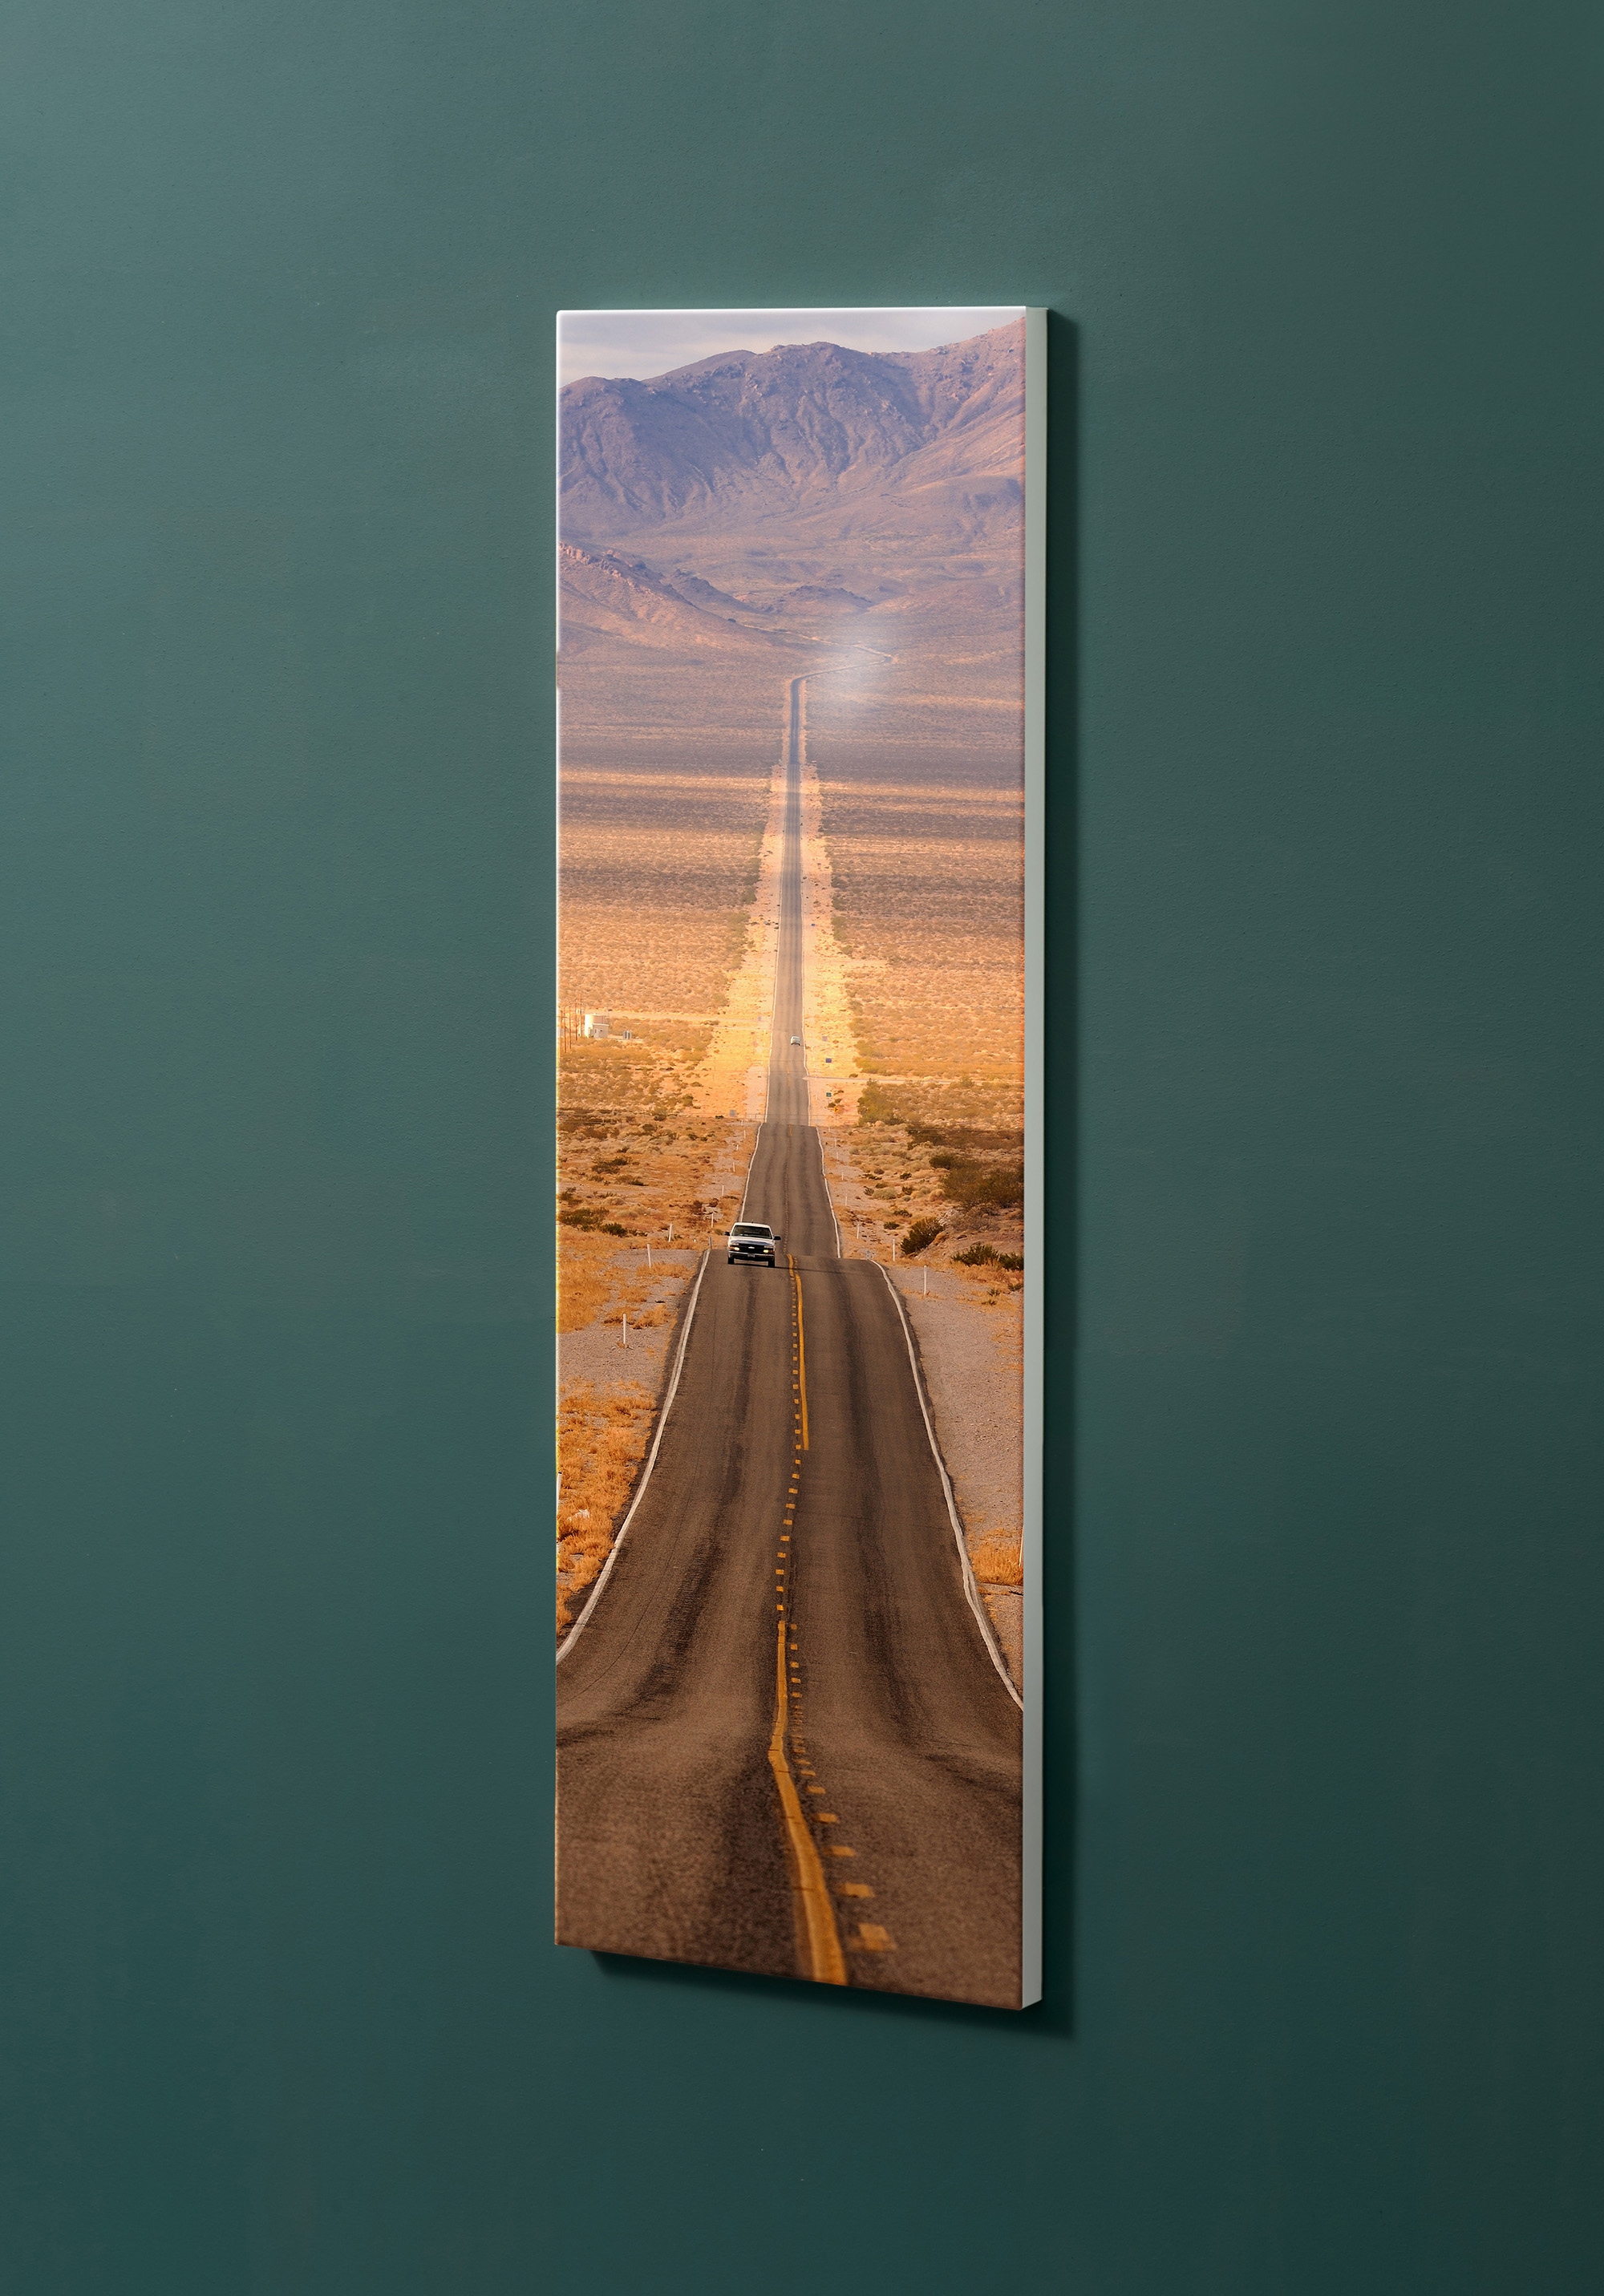 Magnettafel NOTIZ 30x90cm Motiv-Pinnwand M11 Route 66